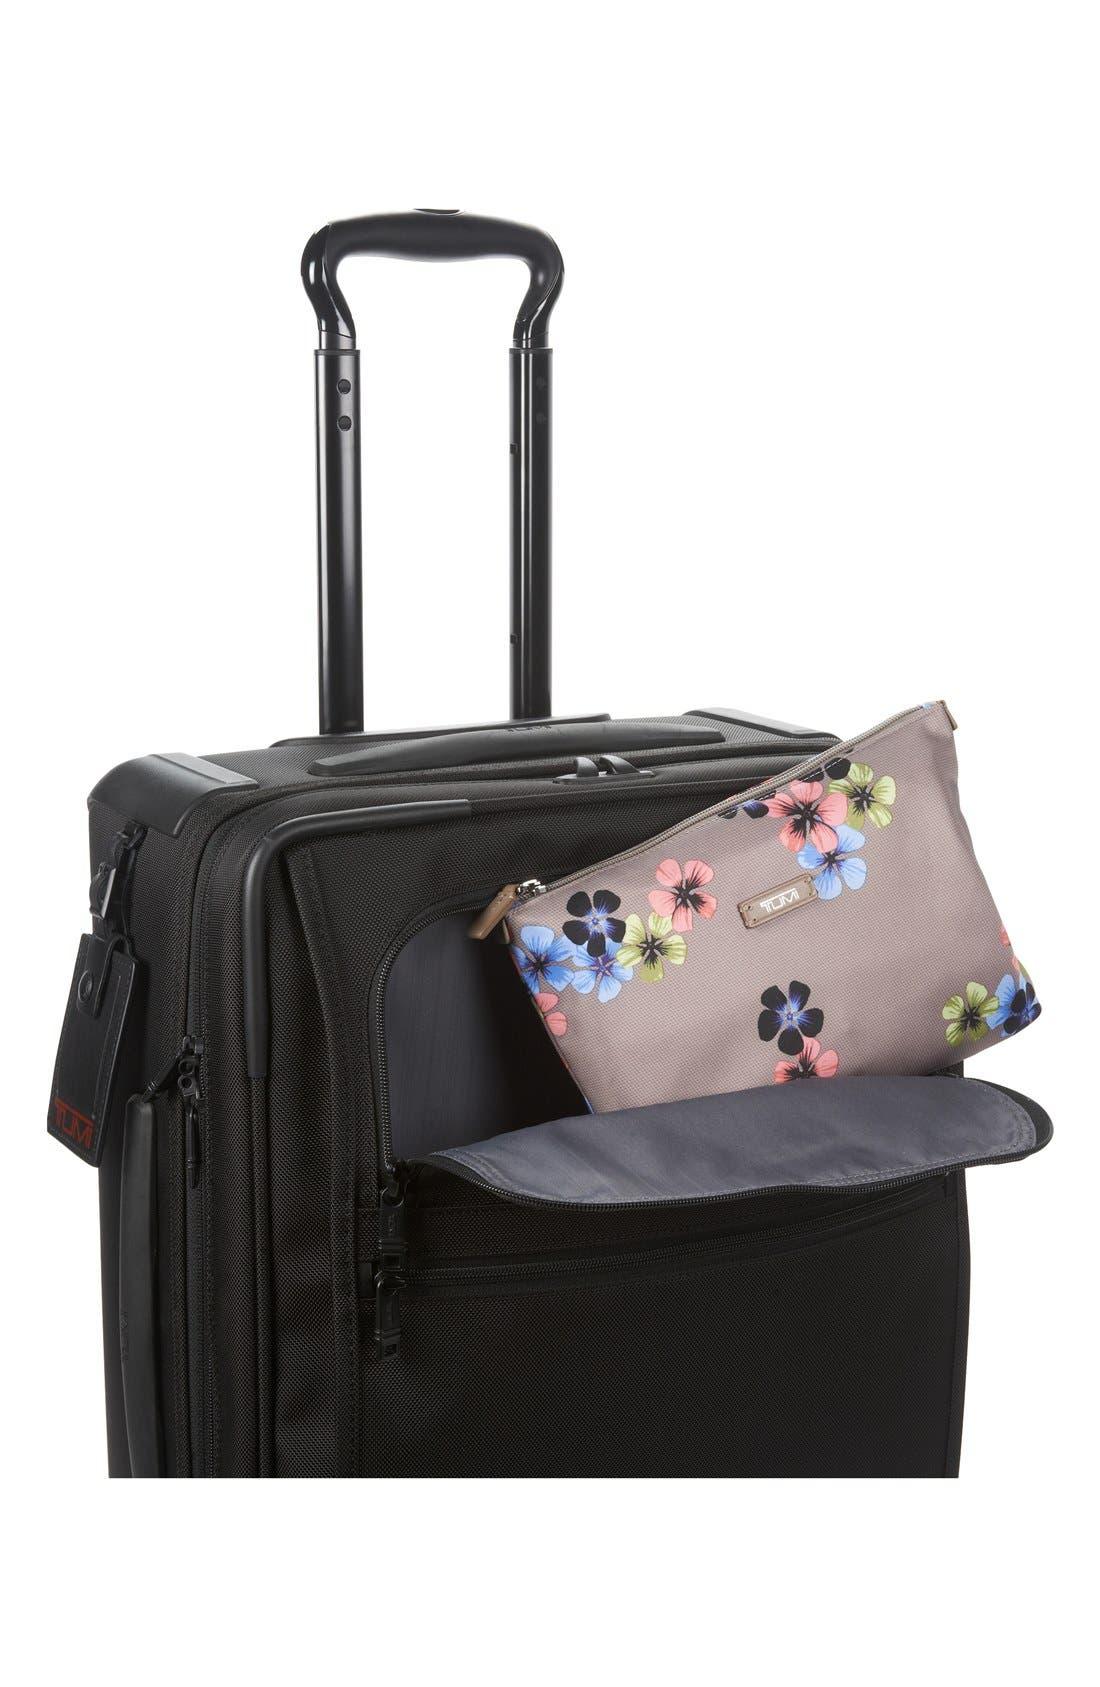 'Just In Case' Packable Duffel Bag,                             Alternate thumbnail 5, color,                             250